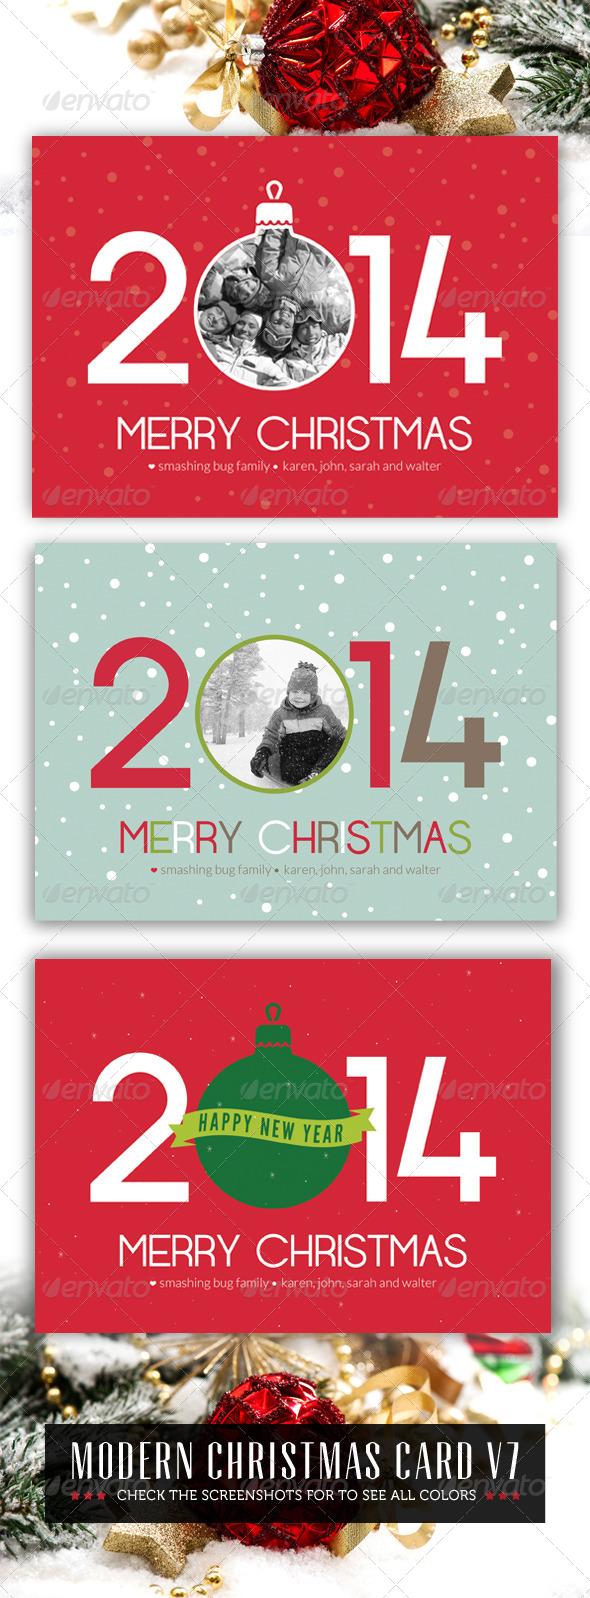 GraphicRiver Modern Christmas Card V8 6418758